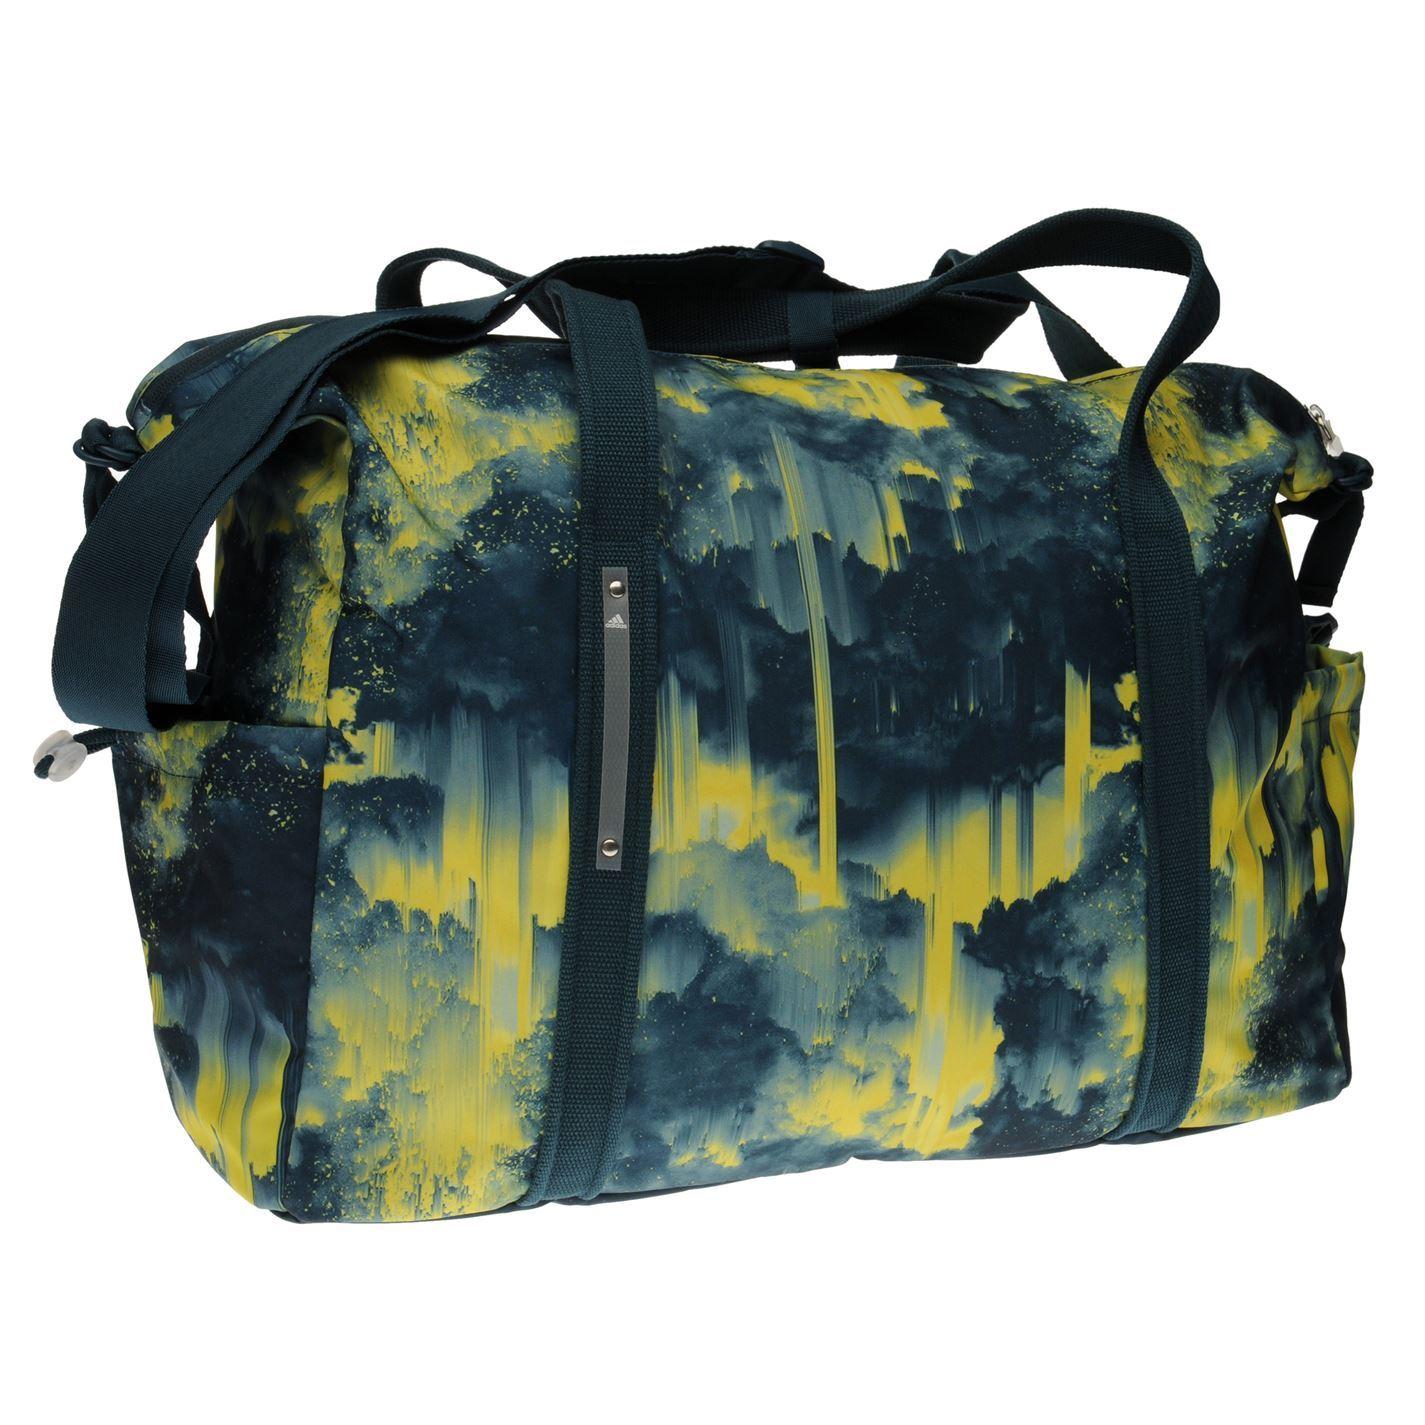 8a82b934e95f adidas Womens Bags Team Bag Holdall Carryall Backpack Shopper Tote Duffel  Bag